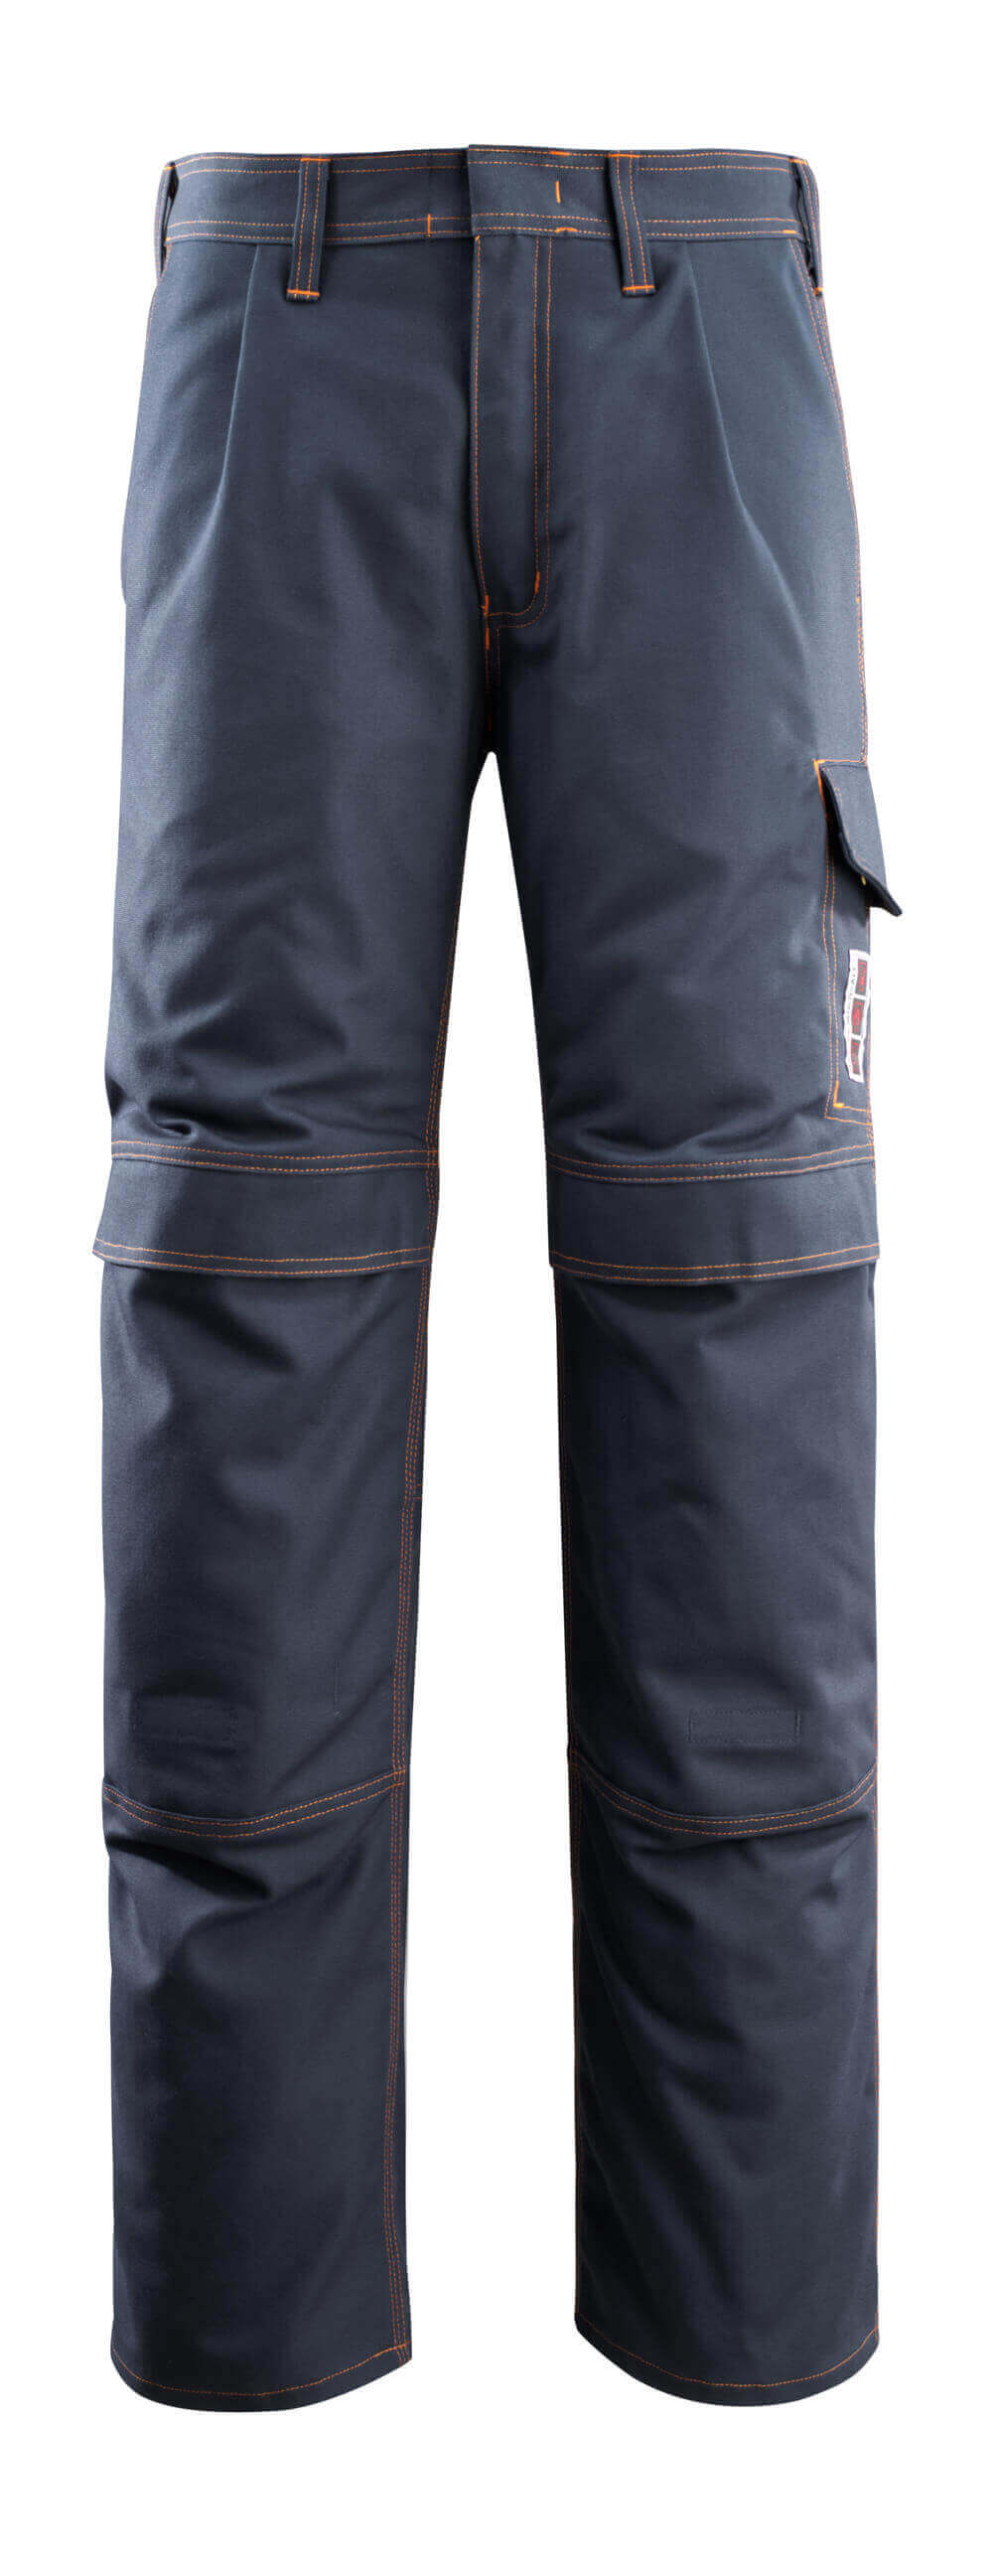 06679-135-010 Pantalon avec poches genouillères - Marine foncé